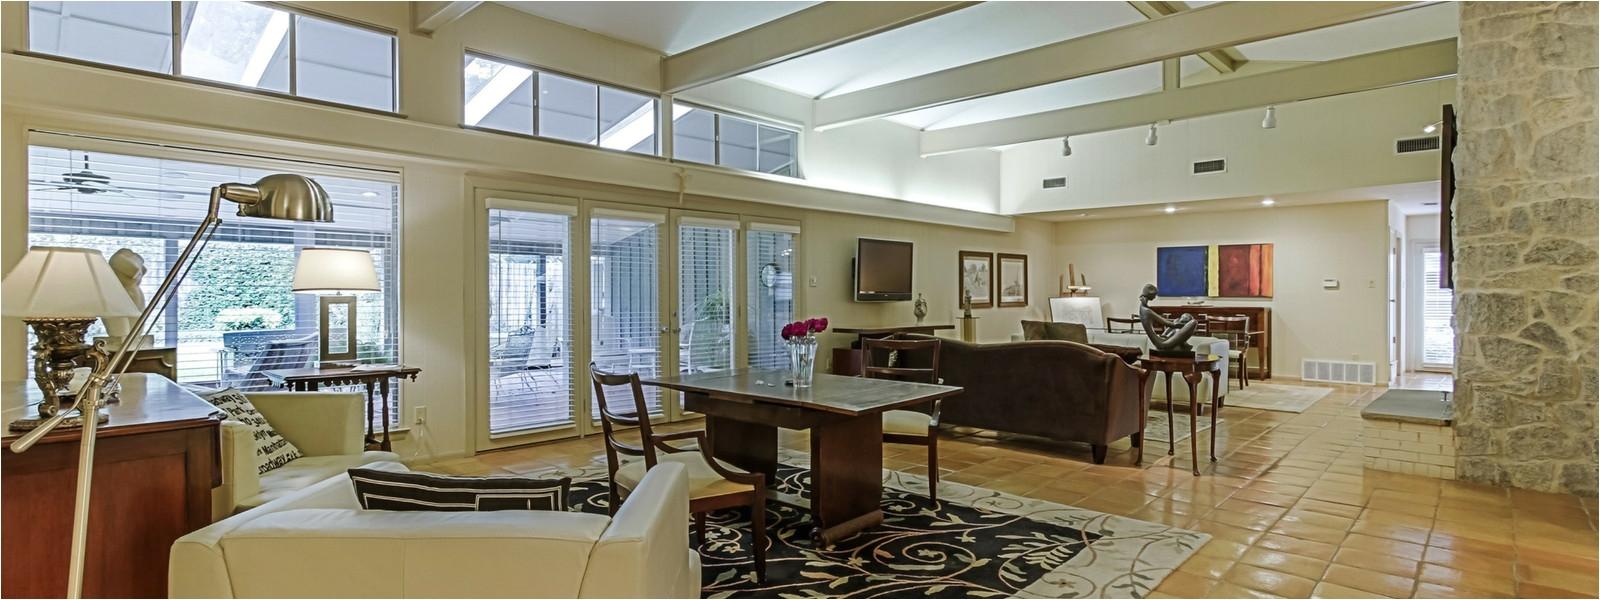 buddys furniture odessa tx fresh grand prairie 200k texas lone star realtors